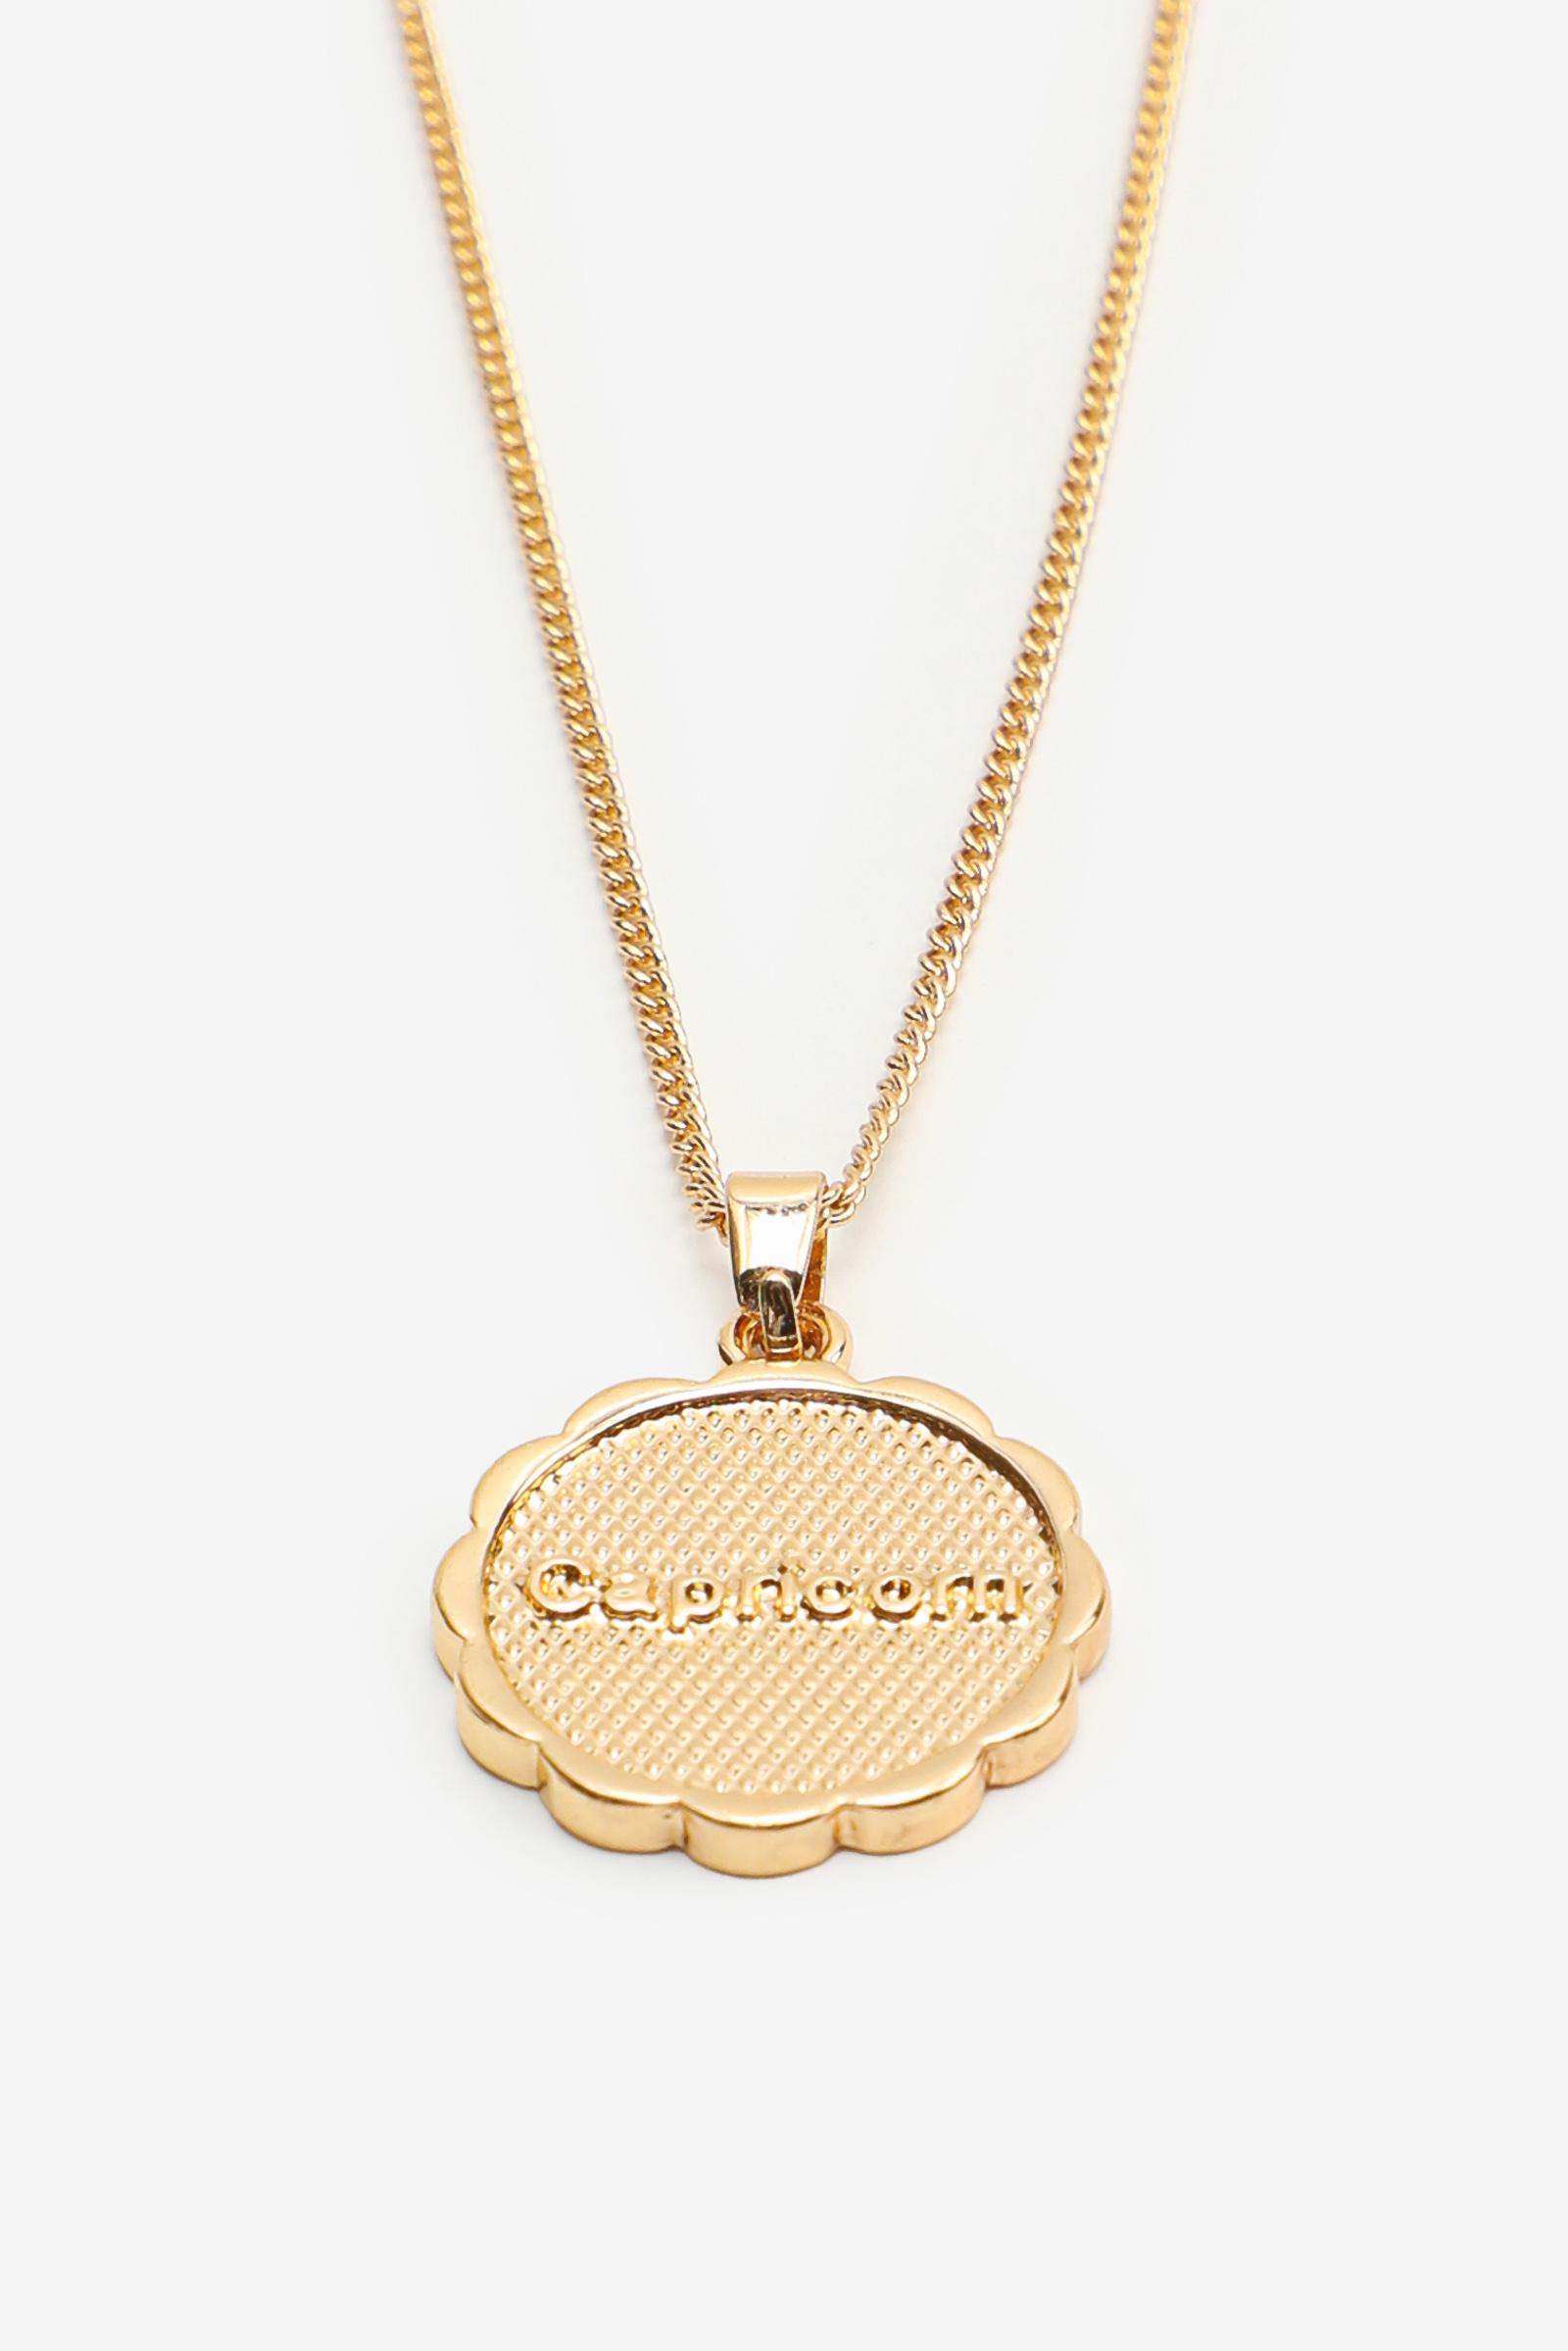 Zodiac Capricorn Pendant Necklace